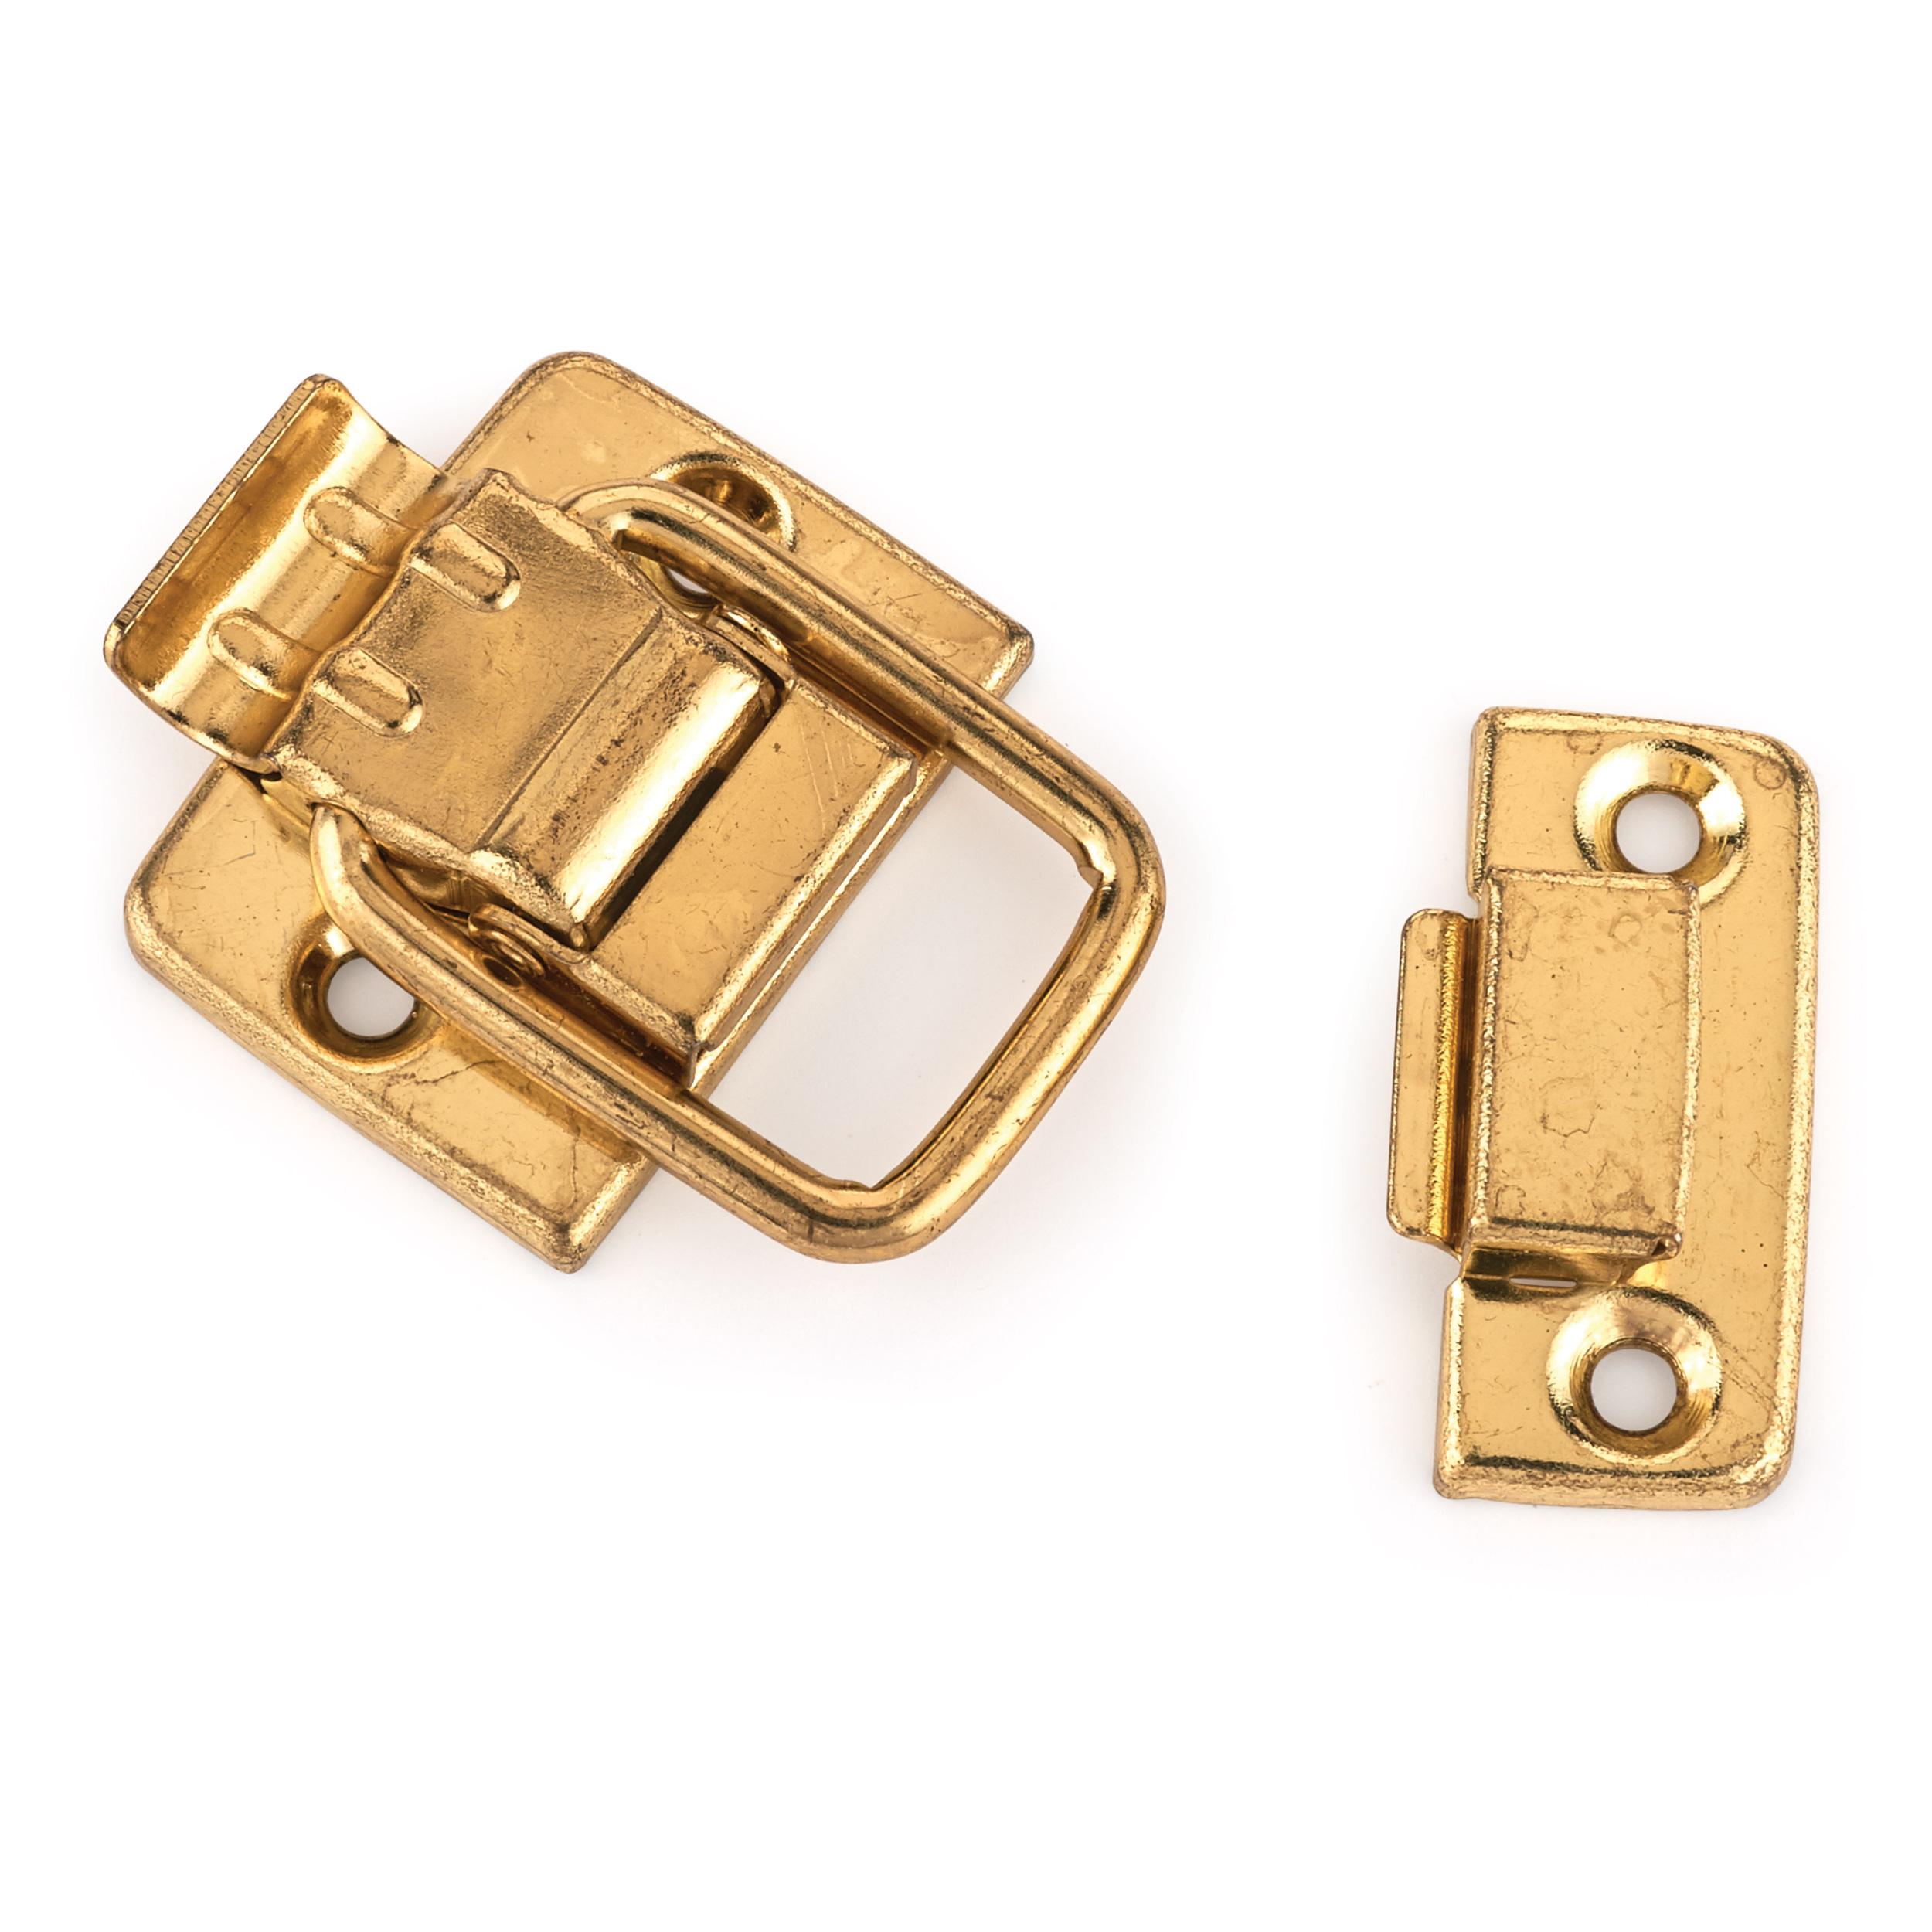 Draw Catch Small Polished Brass Plated 1-piece with Screws